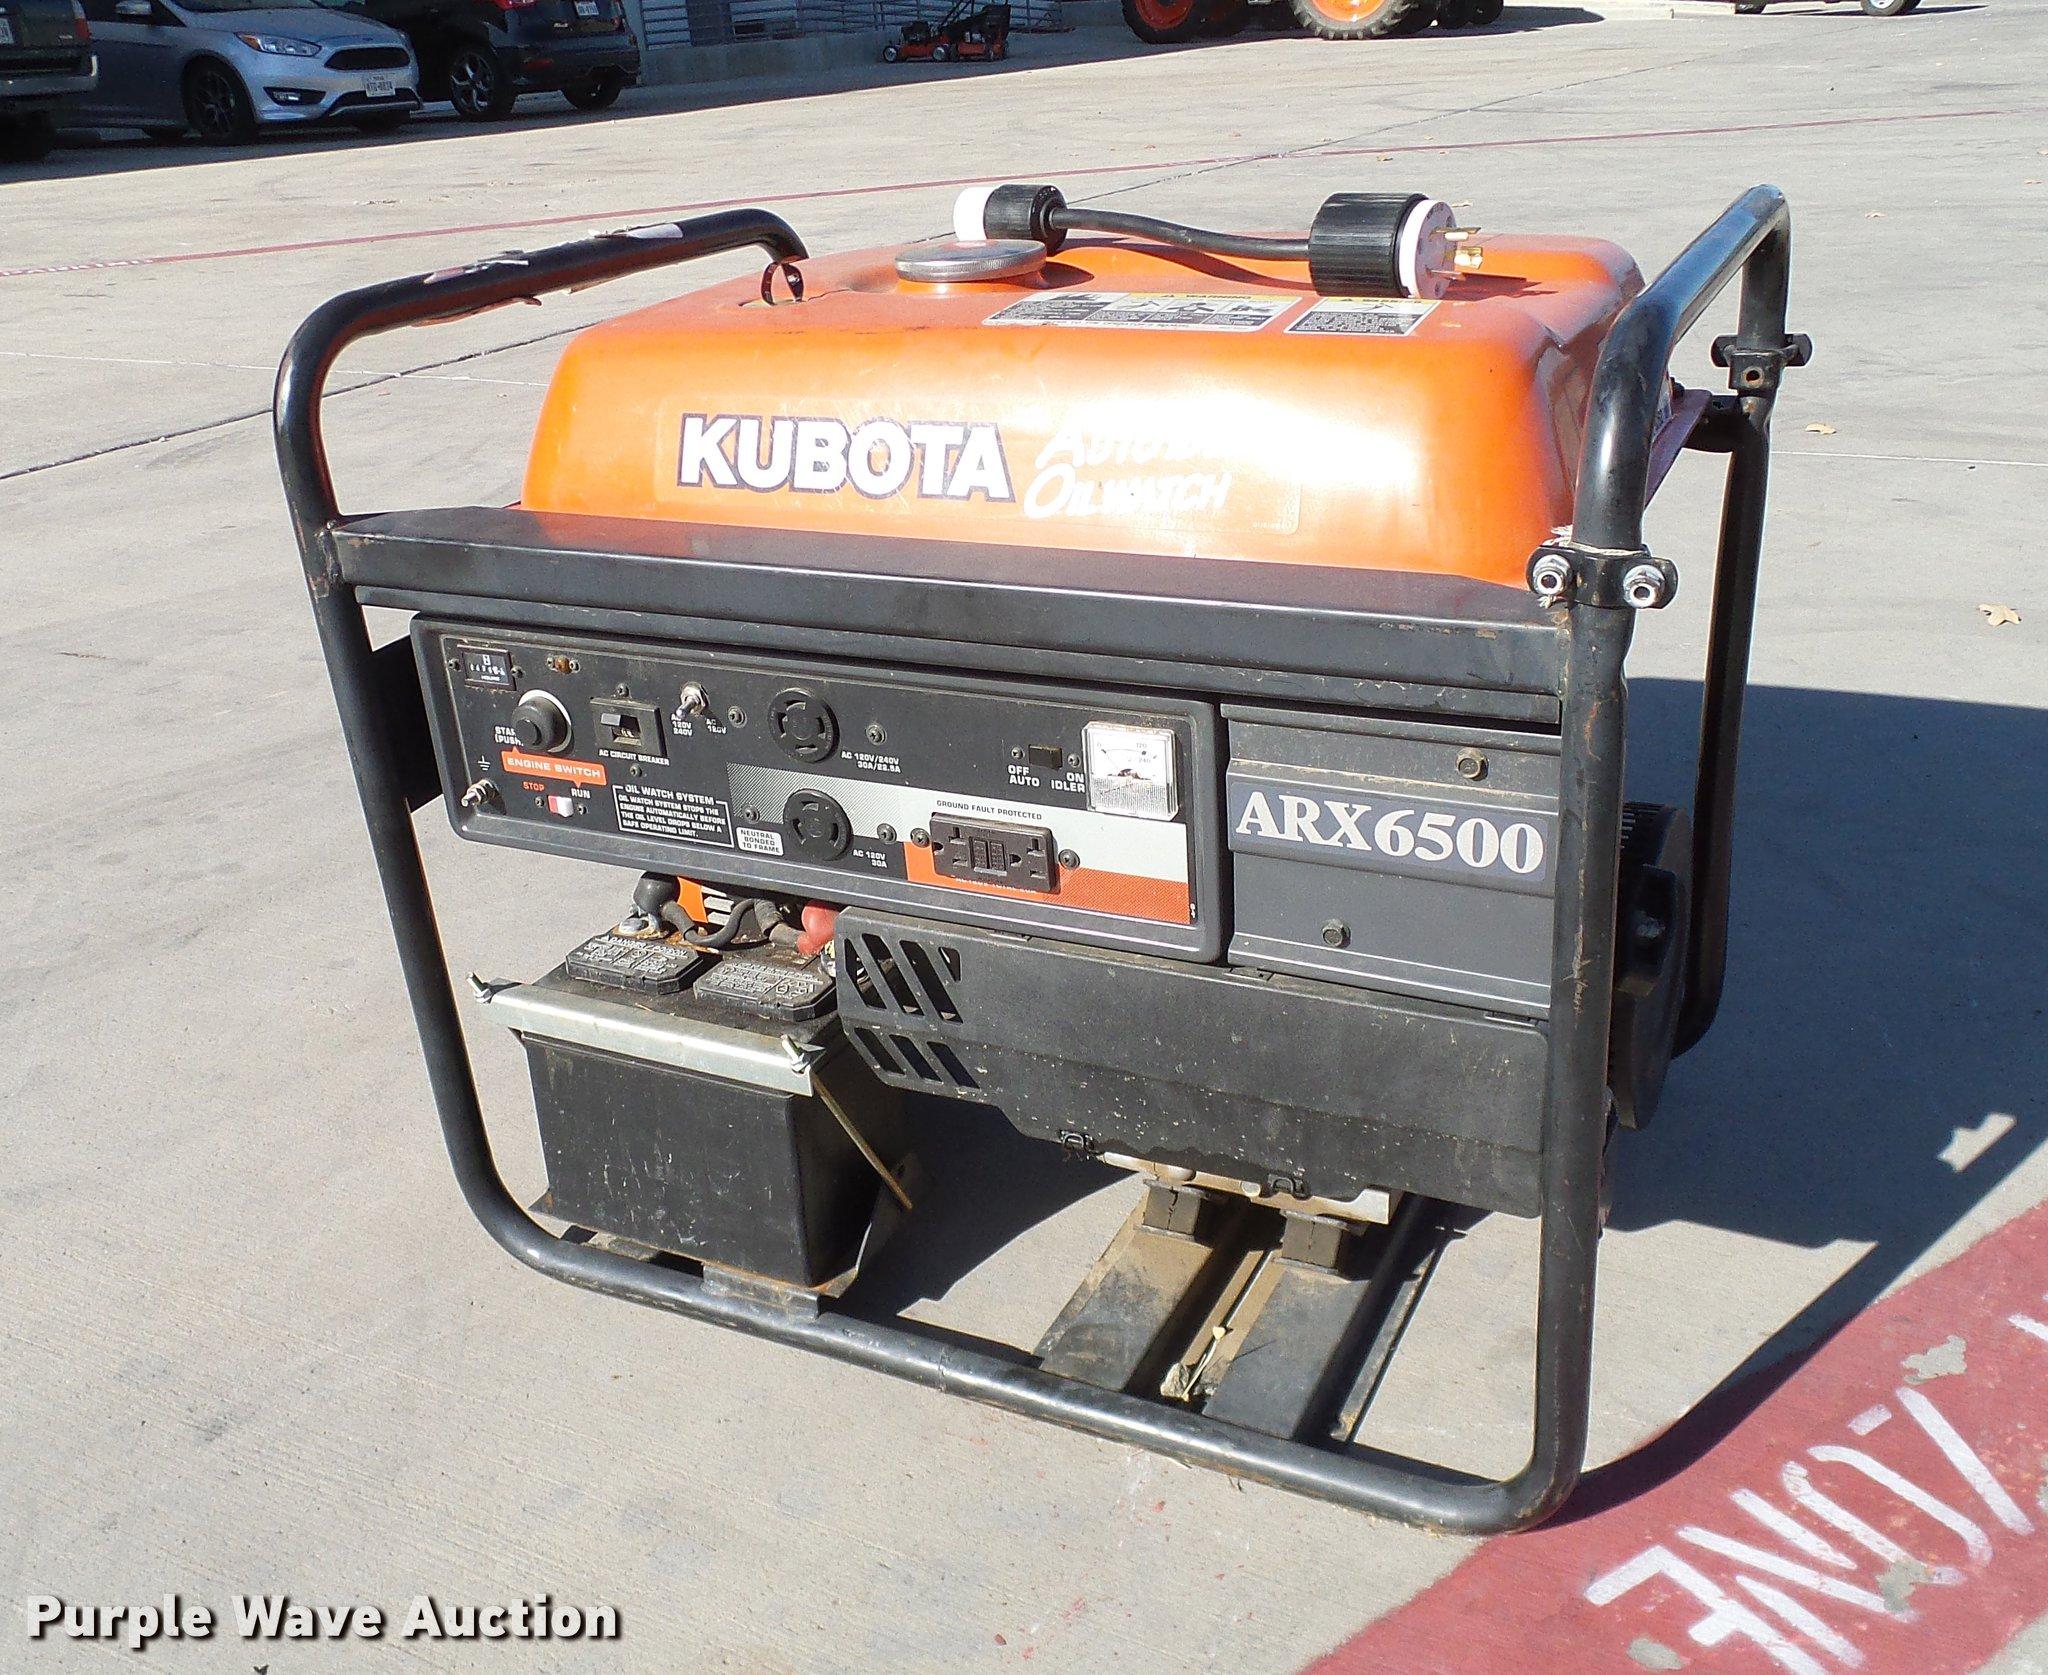 Kubota ARX6500 generator | Item AZ9262 | SOLD! December 27 V